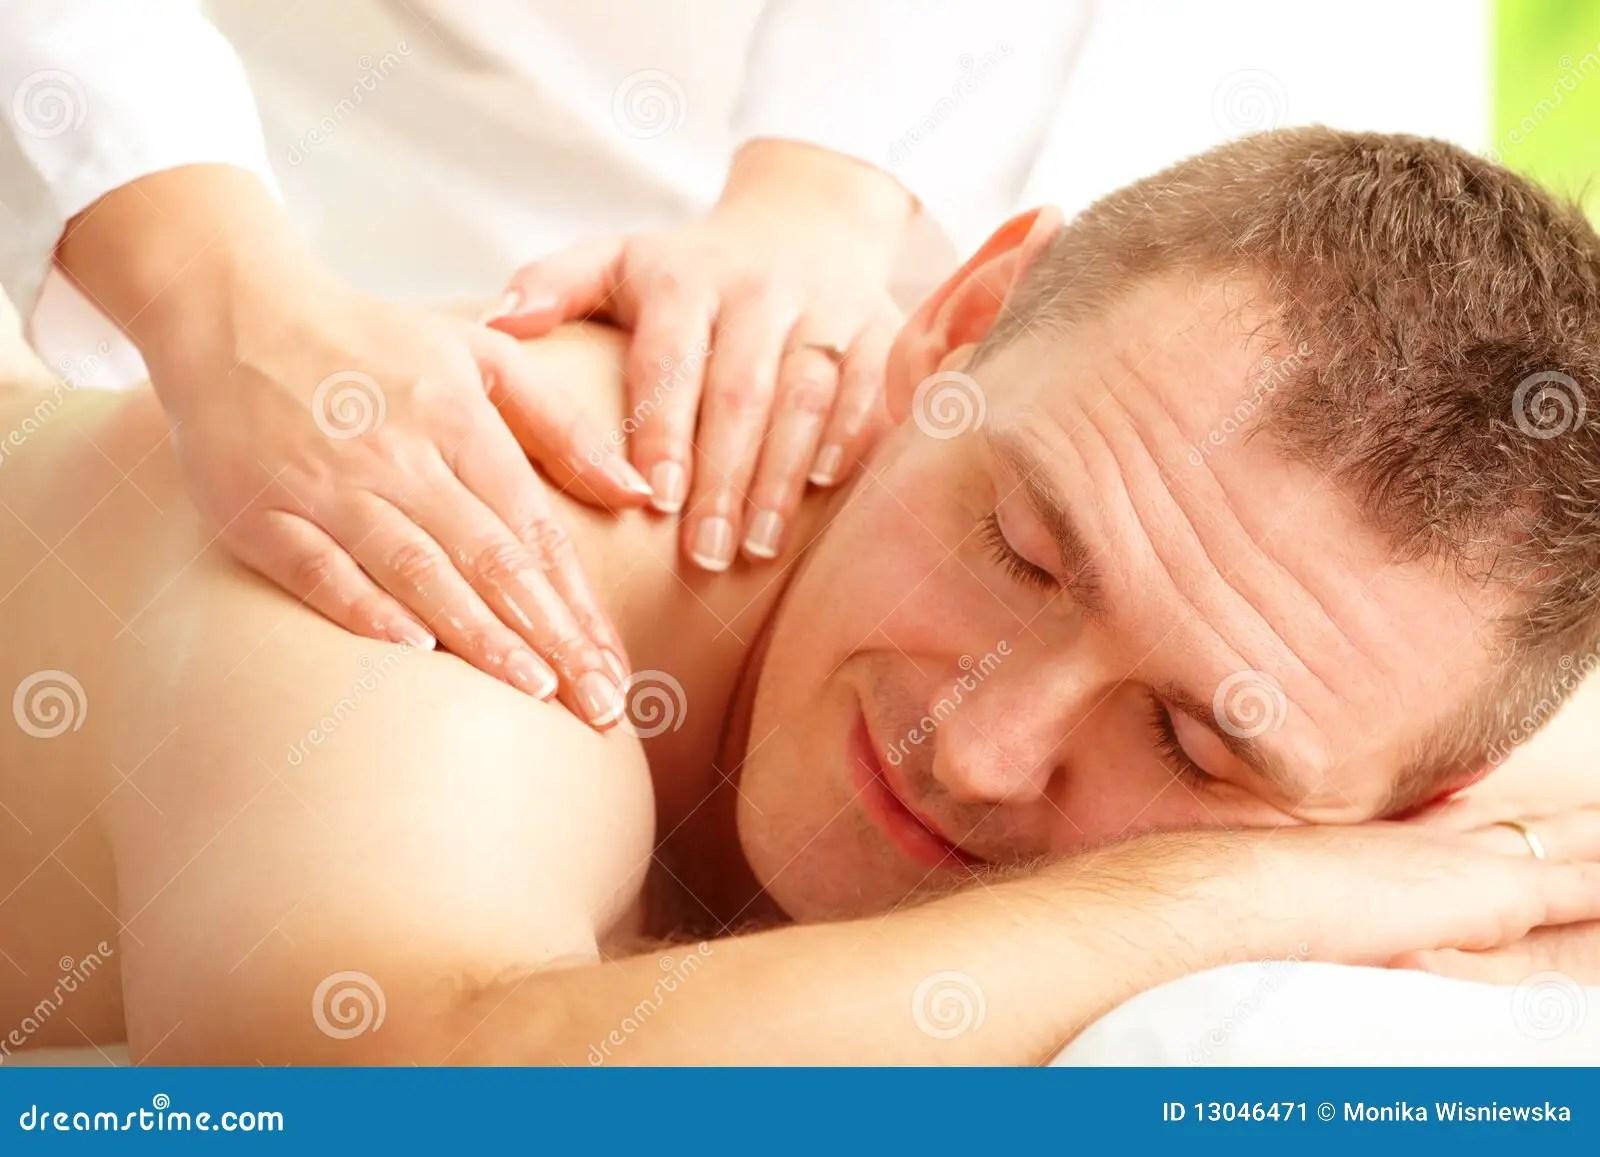 Fresh Skin Care Careers